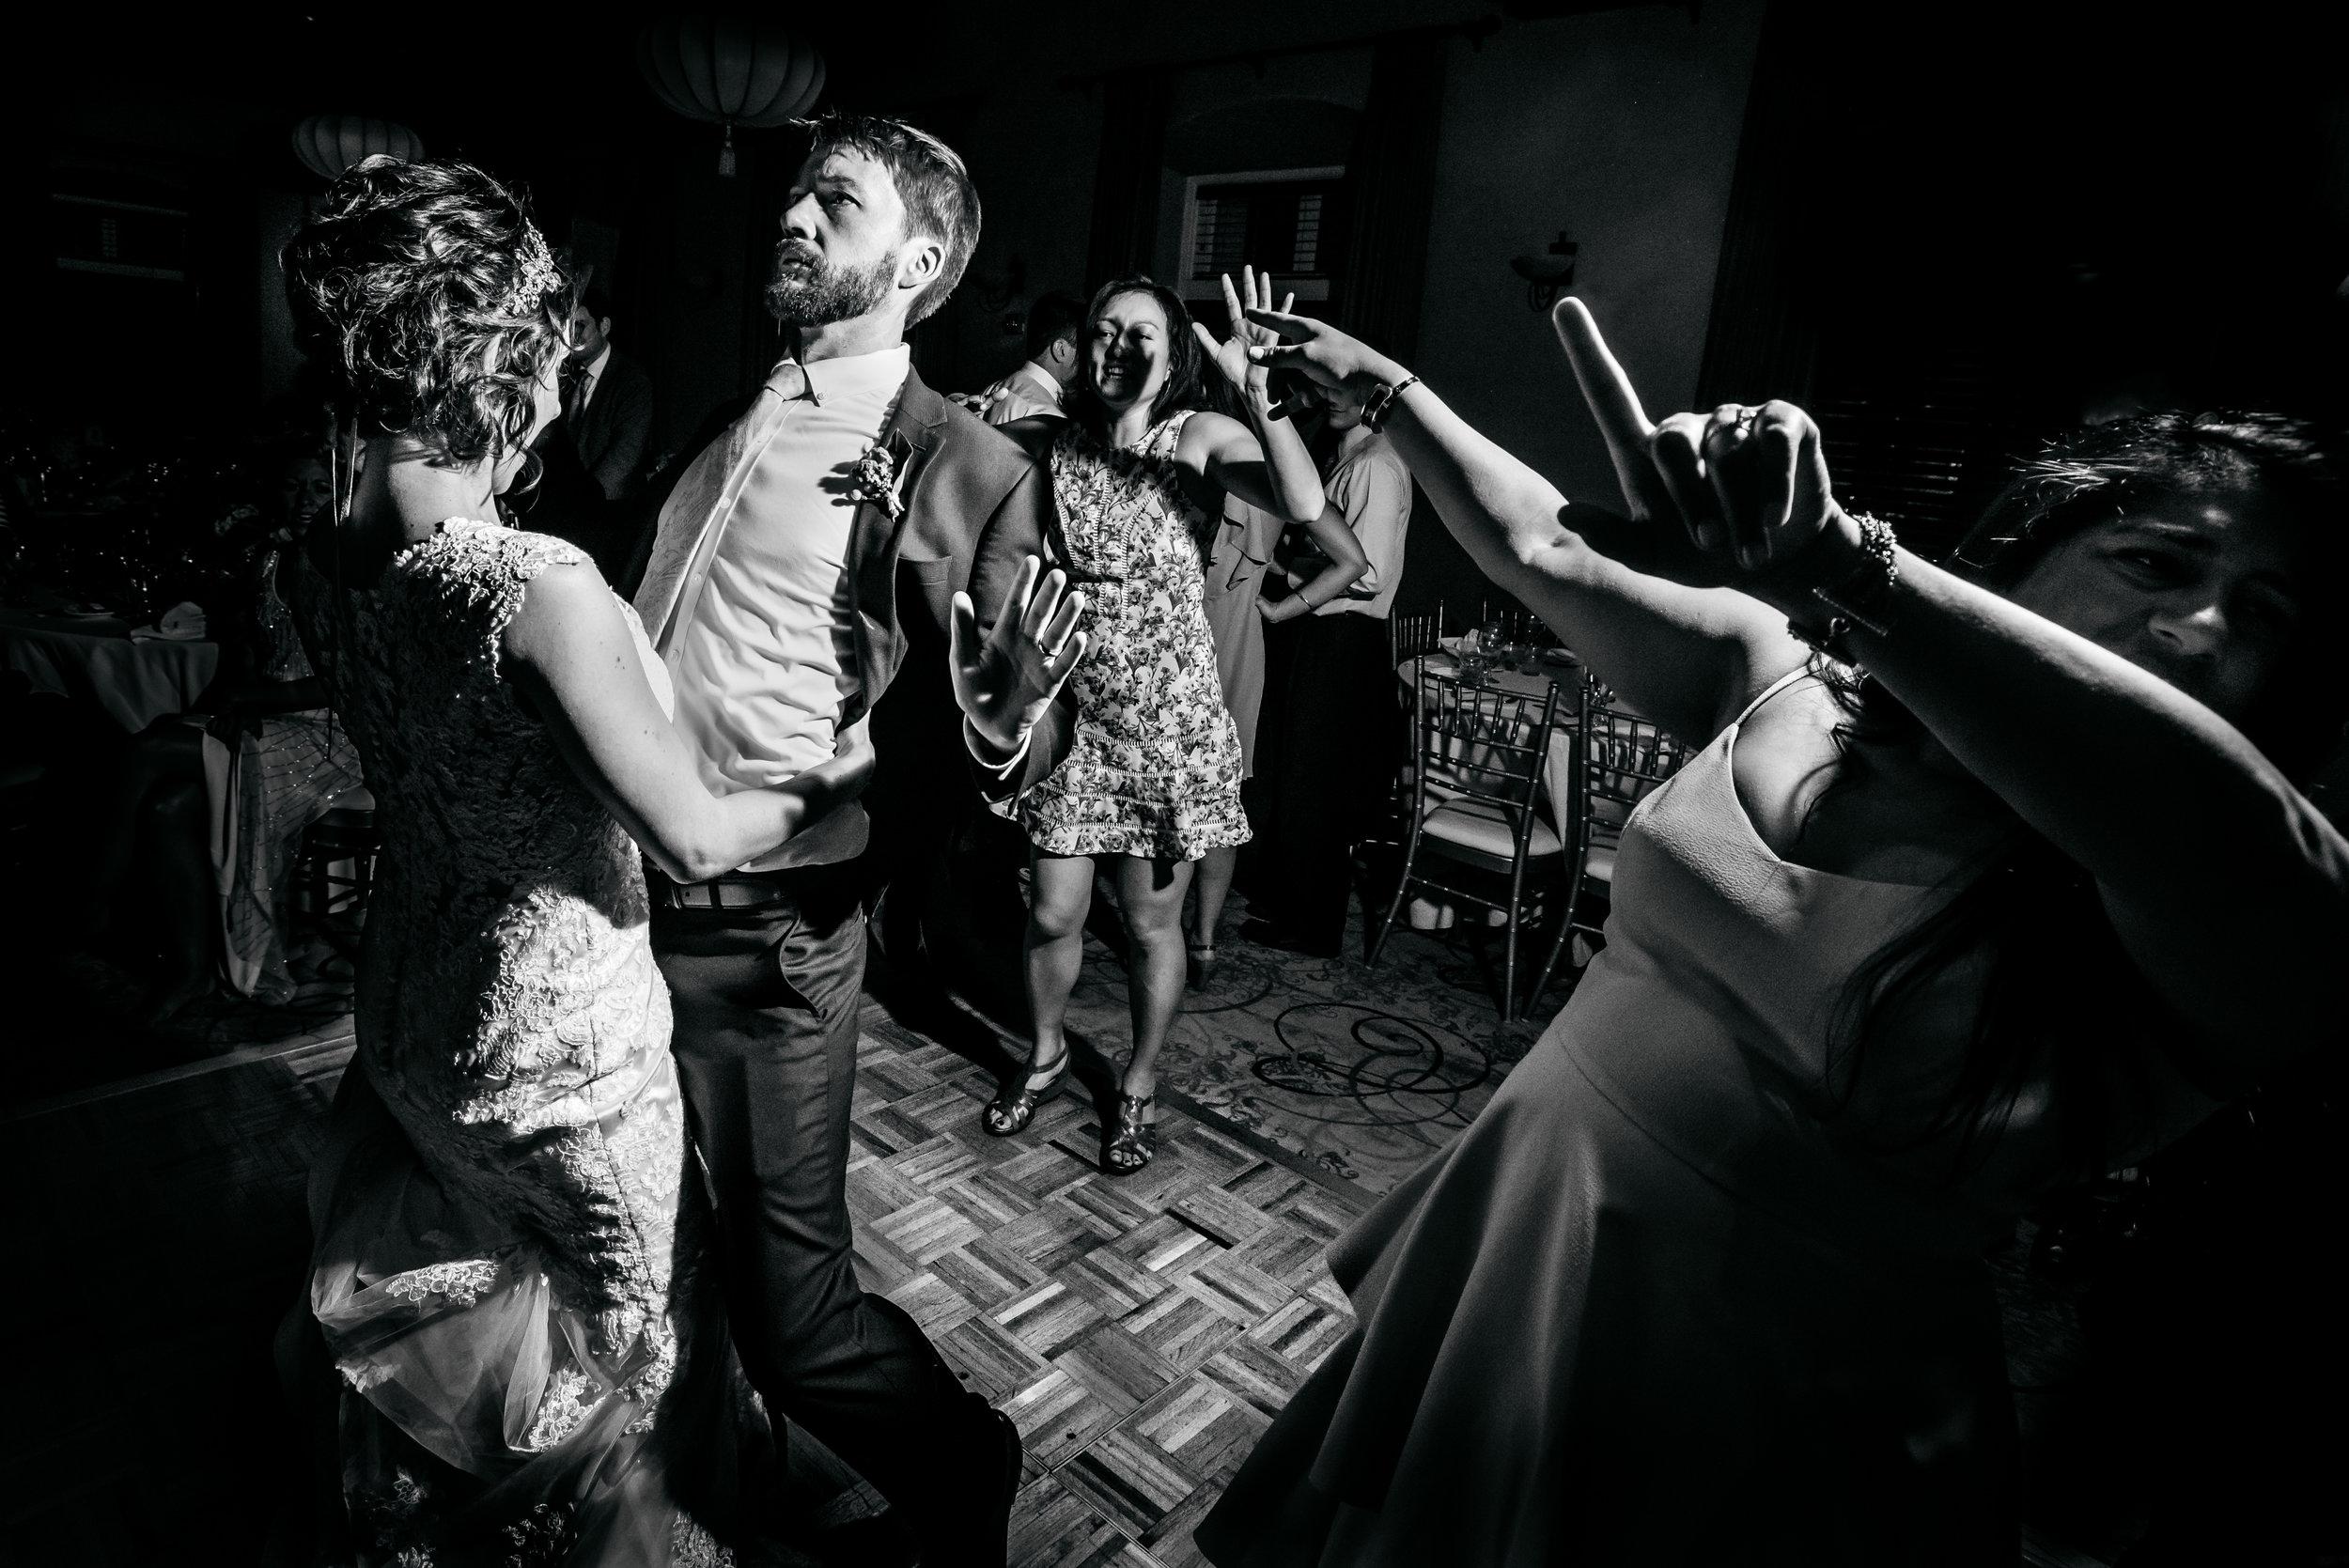 Extended_Play_Photography_Carmella_Wedding-22.jpg